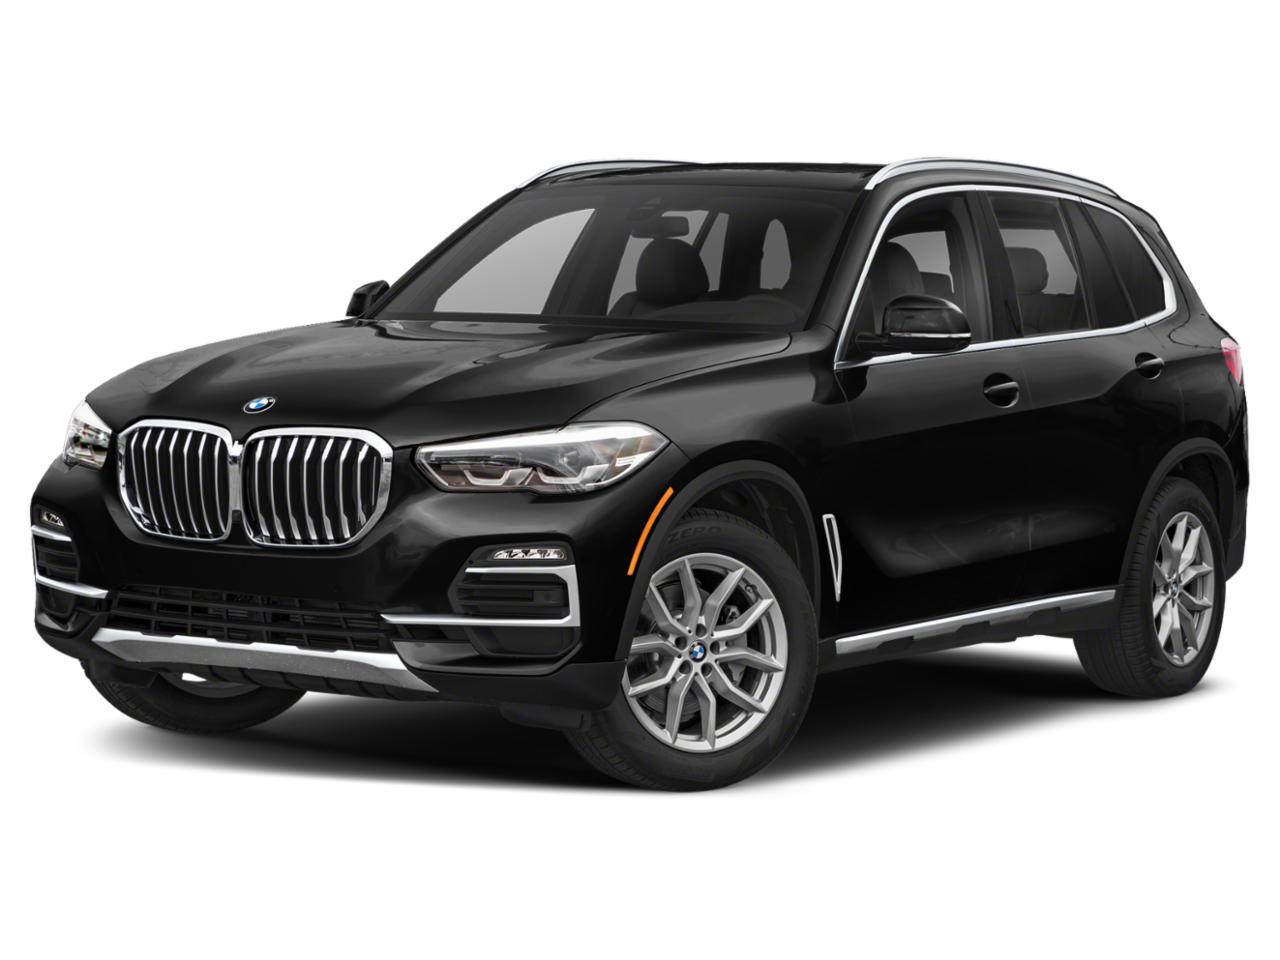 2021 BMW X5 sDrive40i Vehicle Photo in Grapevine, TX 76051